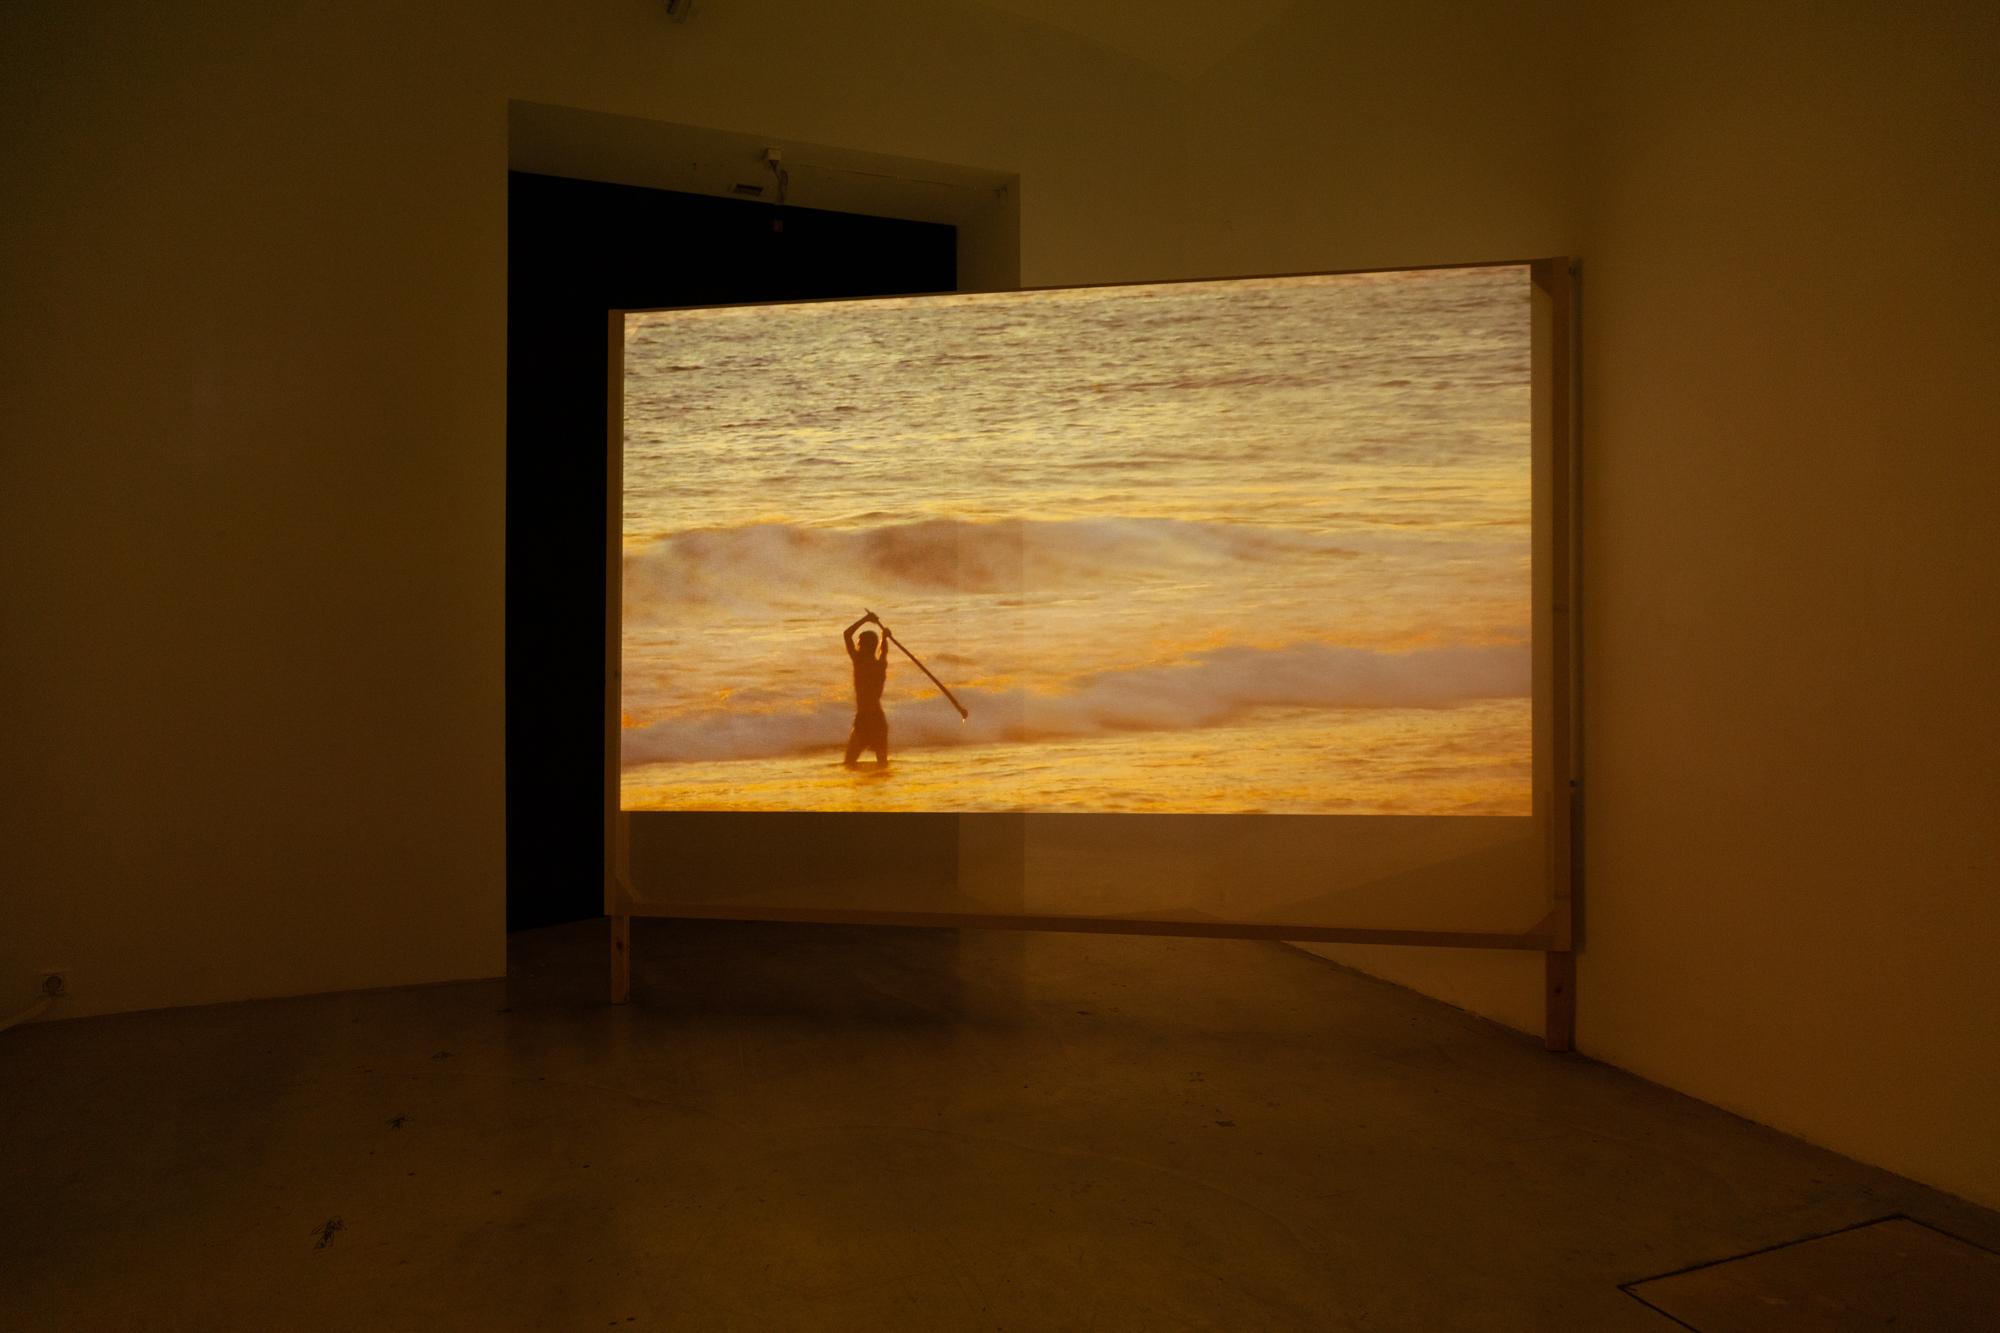 Installationsansicht JERJES, Julien Devaux, Foto: Björn Segschneider